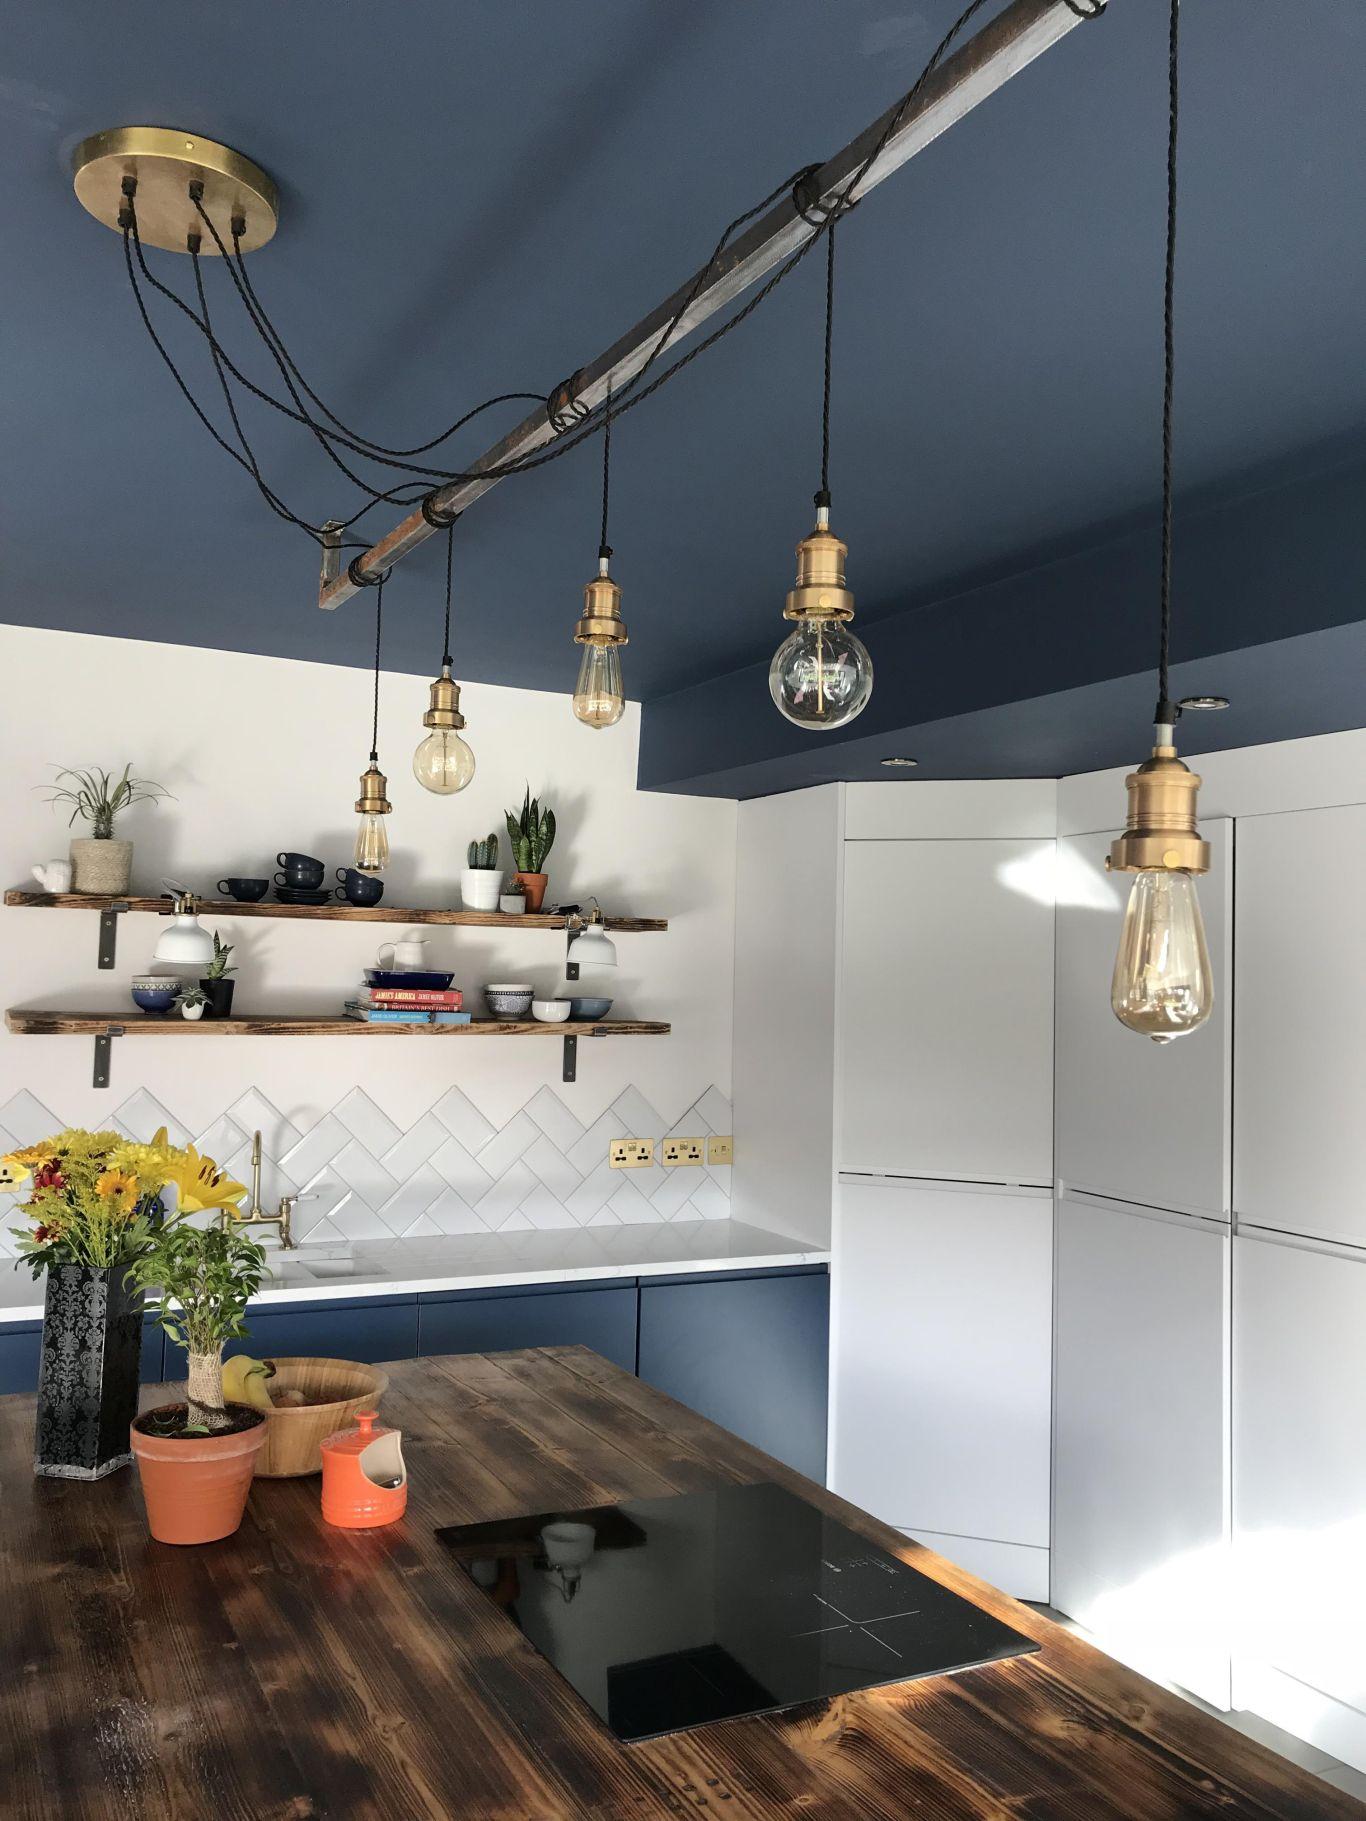 25 kitchen lighting ideas how to plan